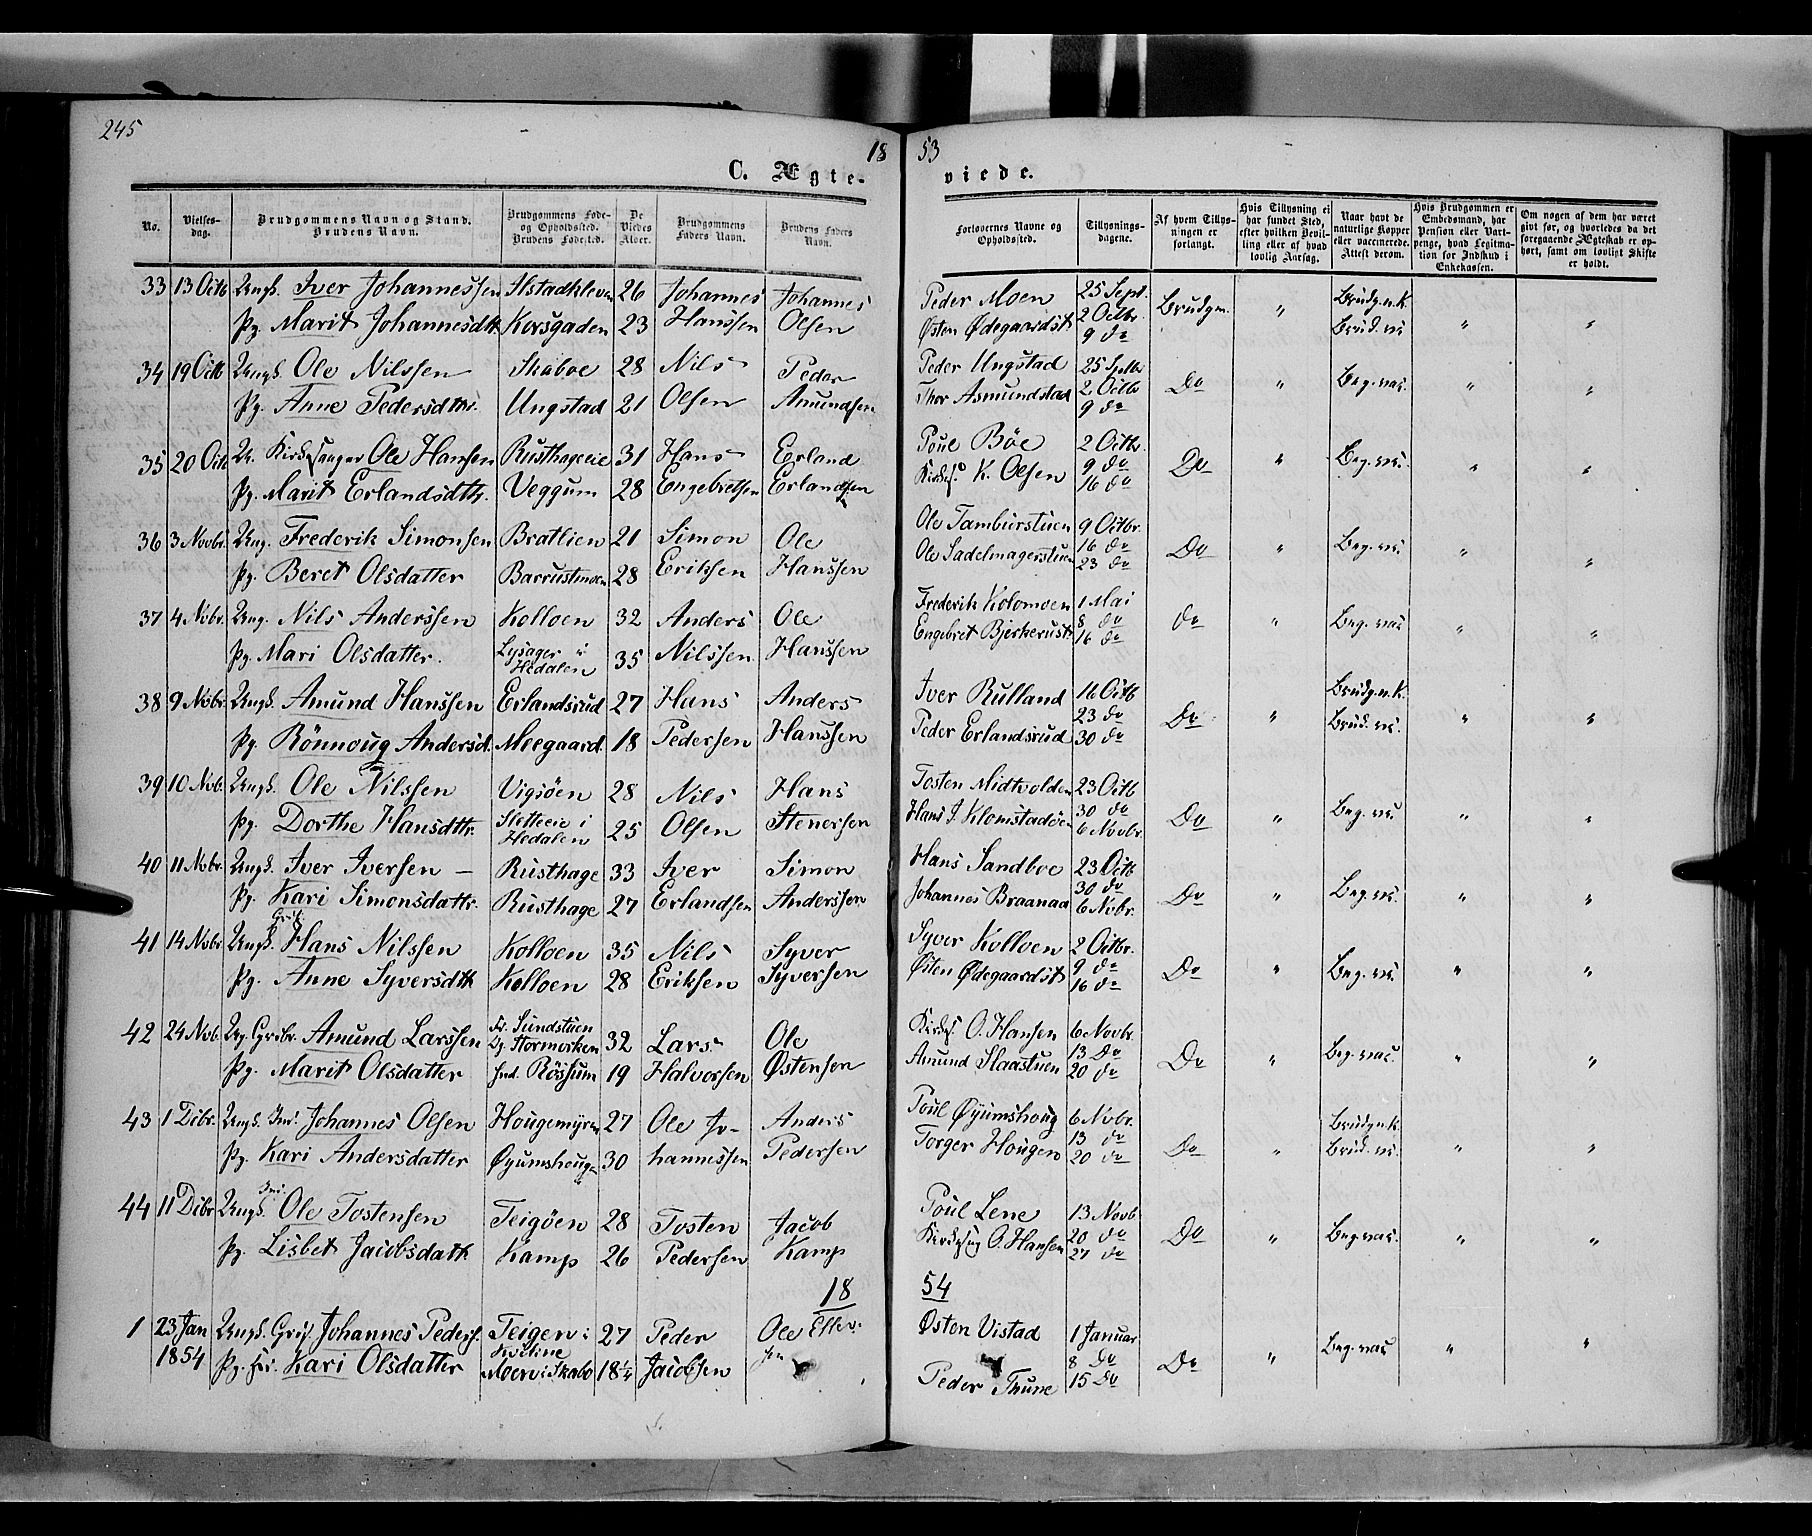 SAH, Nord-Fron prestekontor, Ministerialbok nr. 1, 1851-1864, s. 245